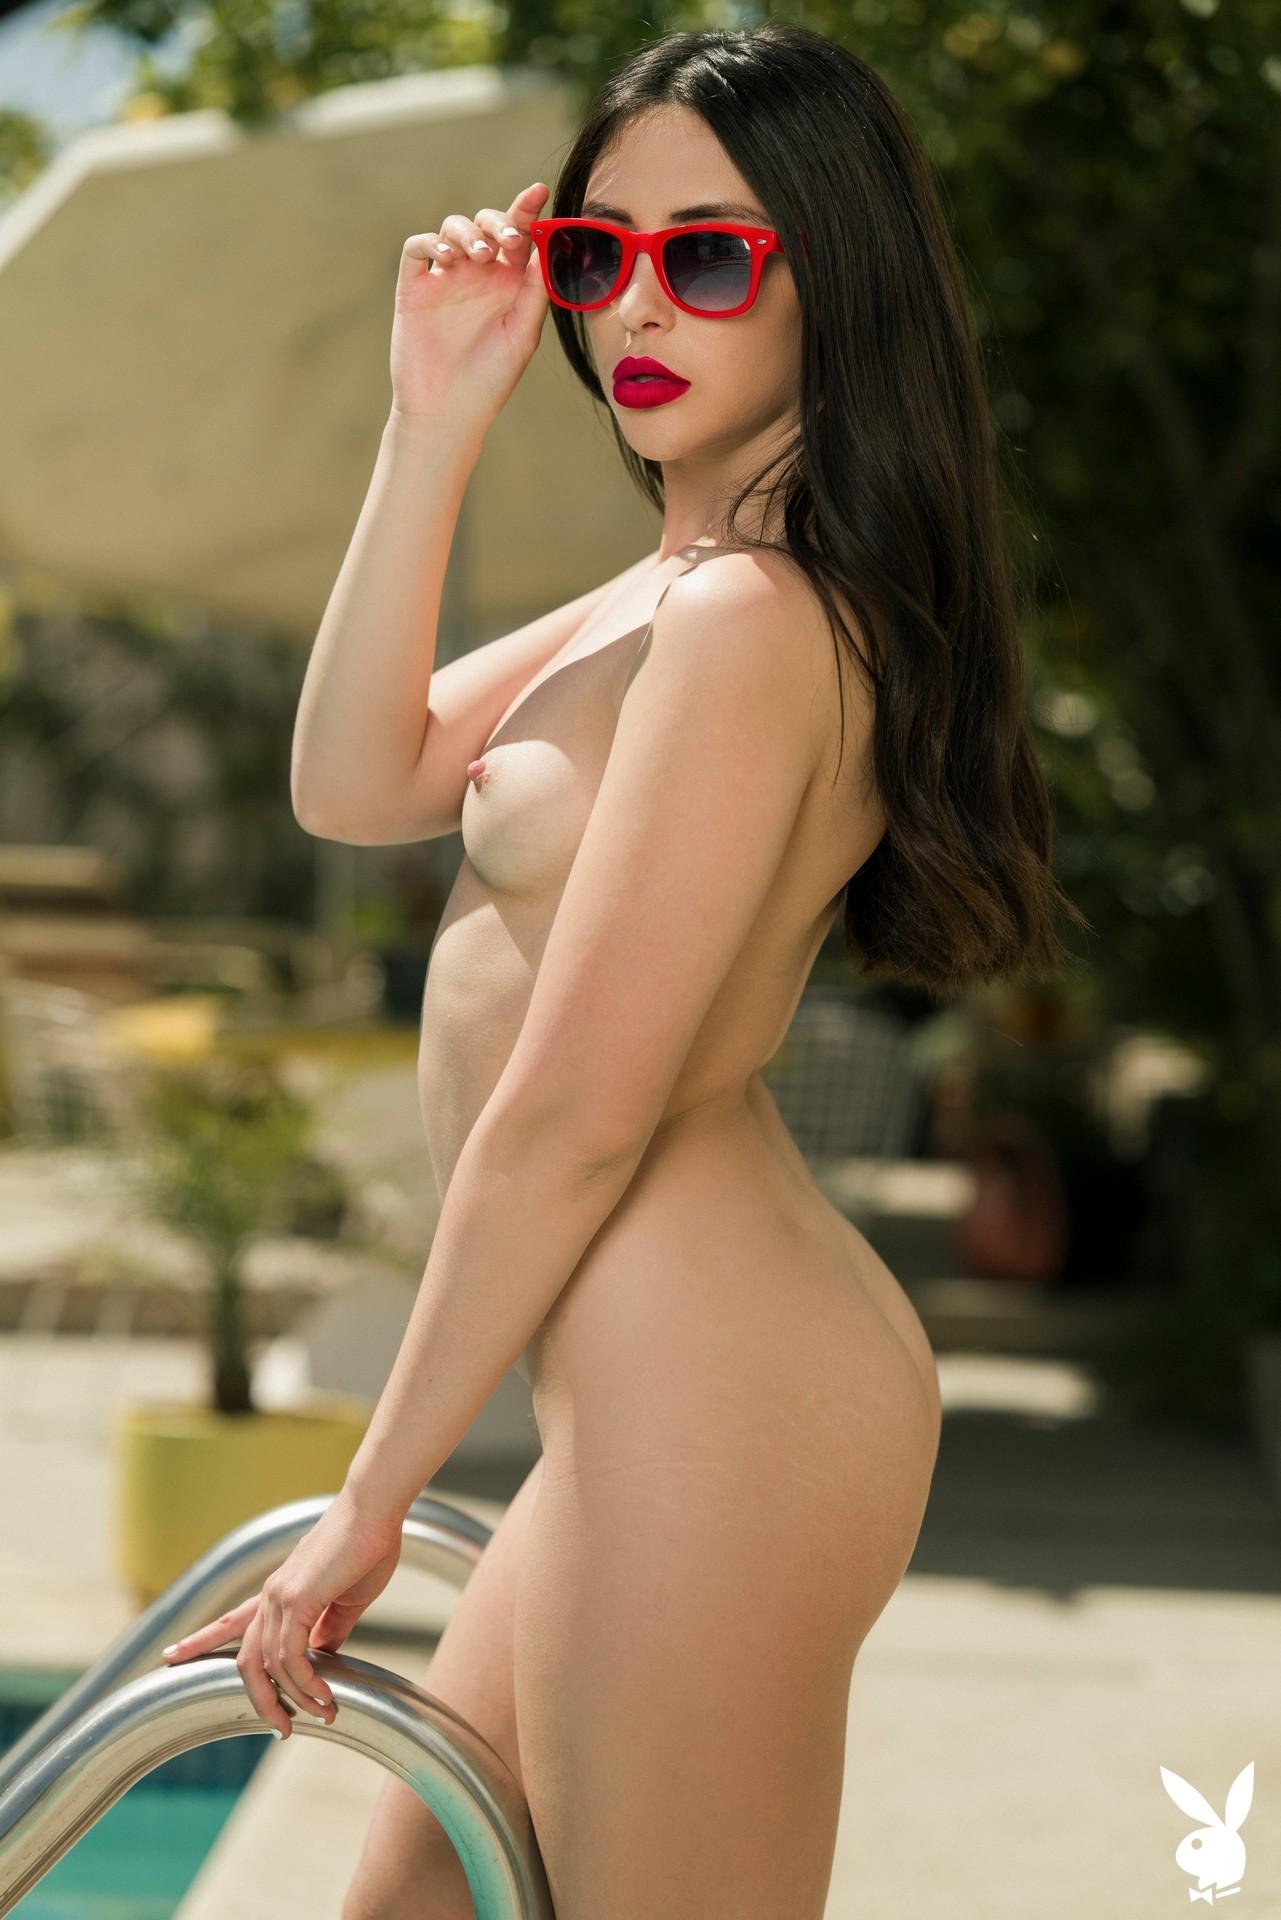 Jane Wilde In Conducting Heat Playboy Plus (18)